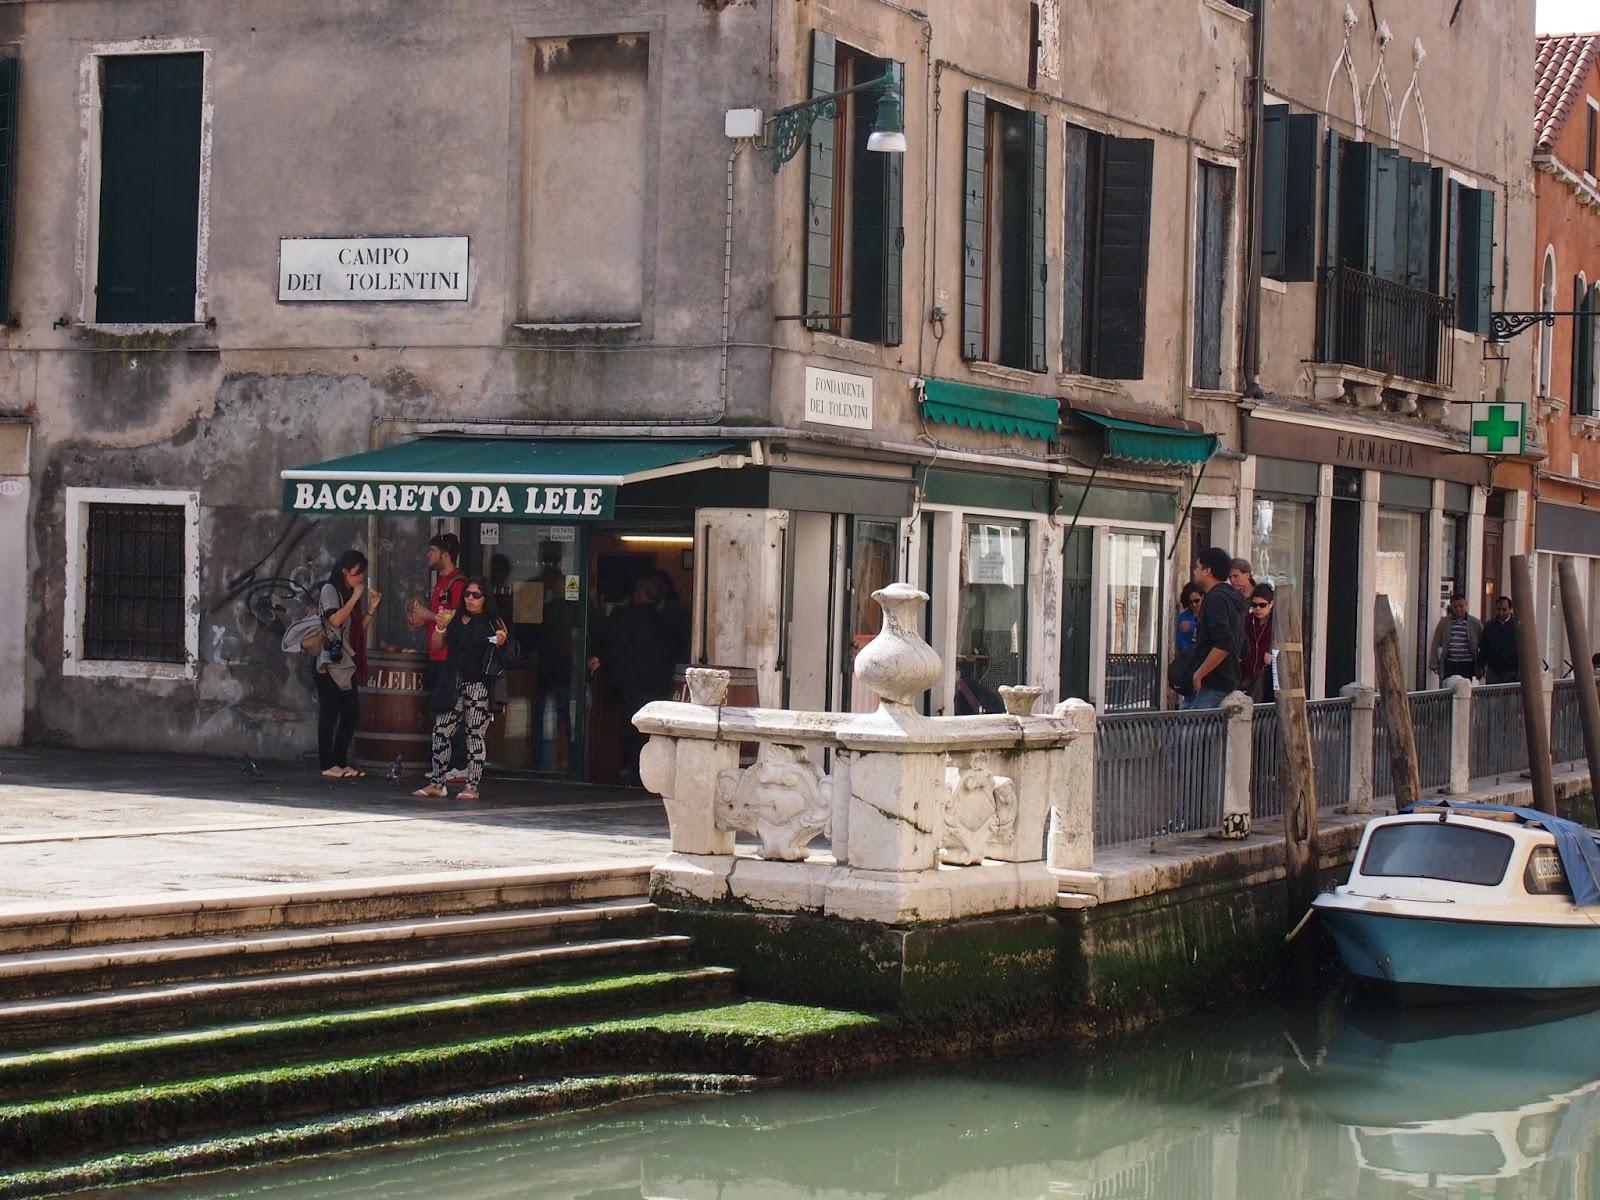 sandwich shop in Venice, Italy